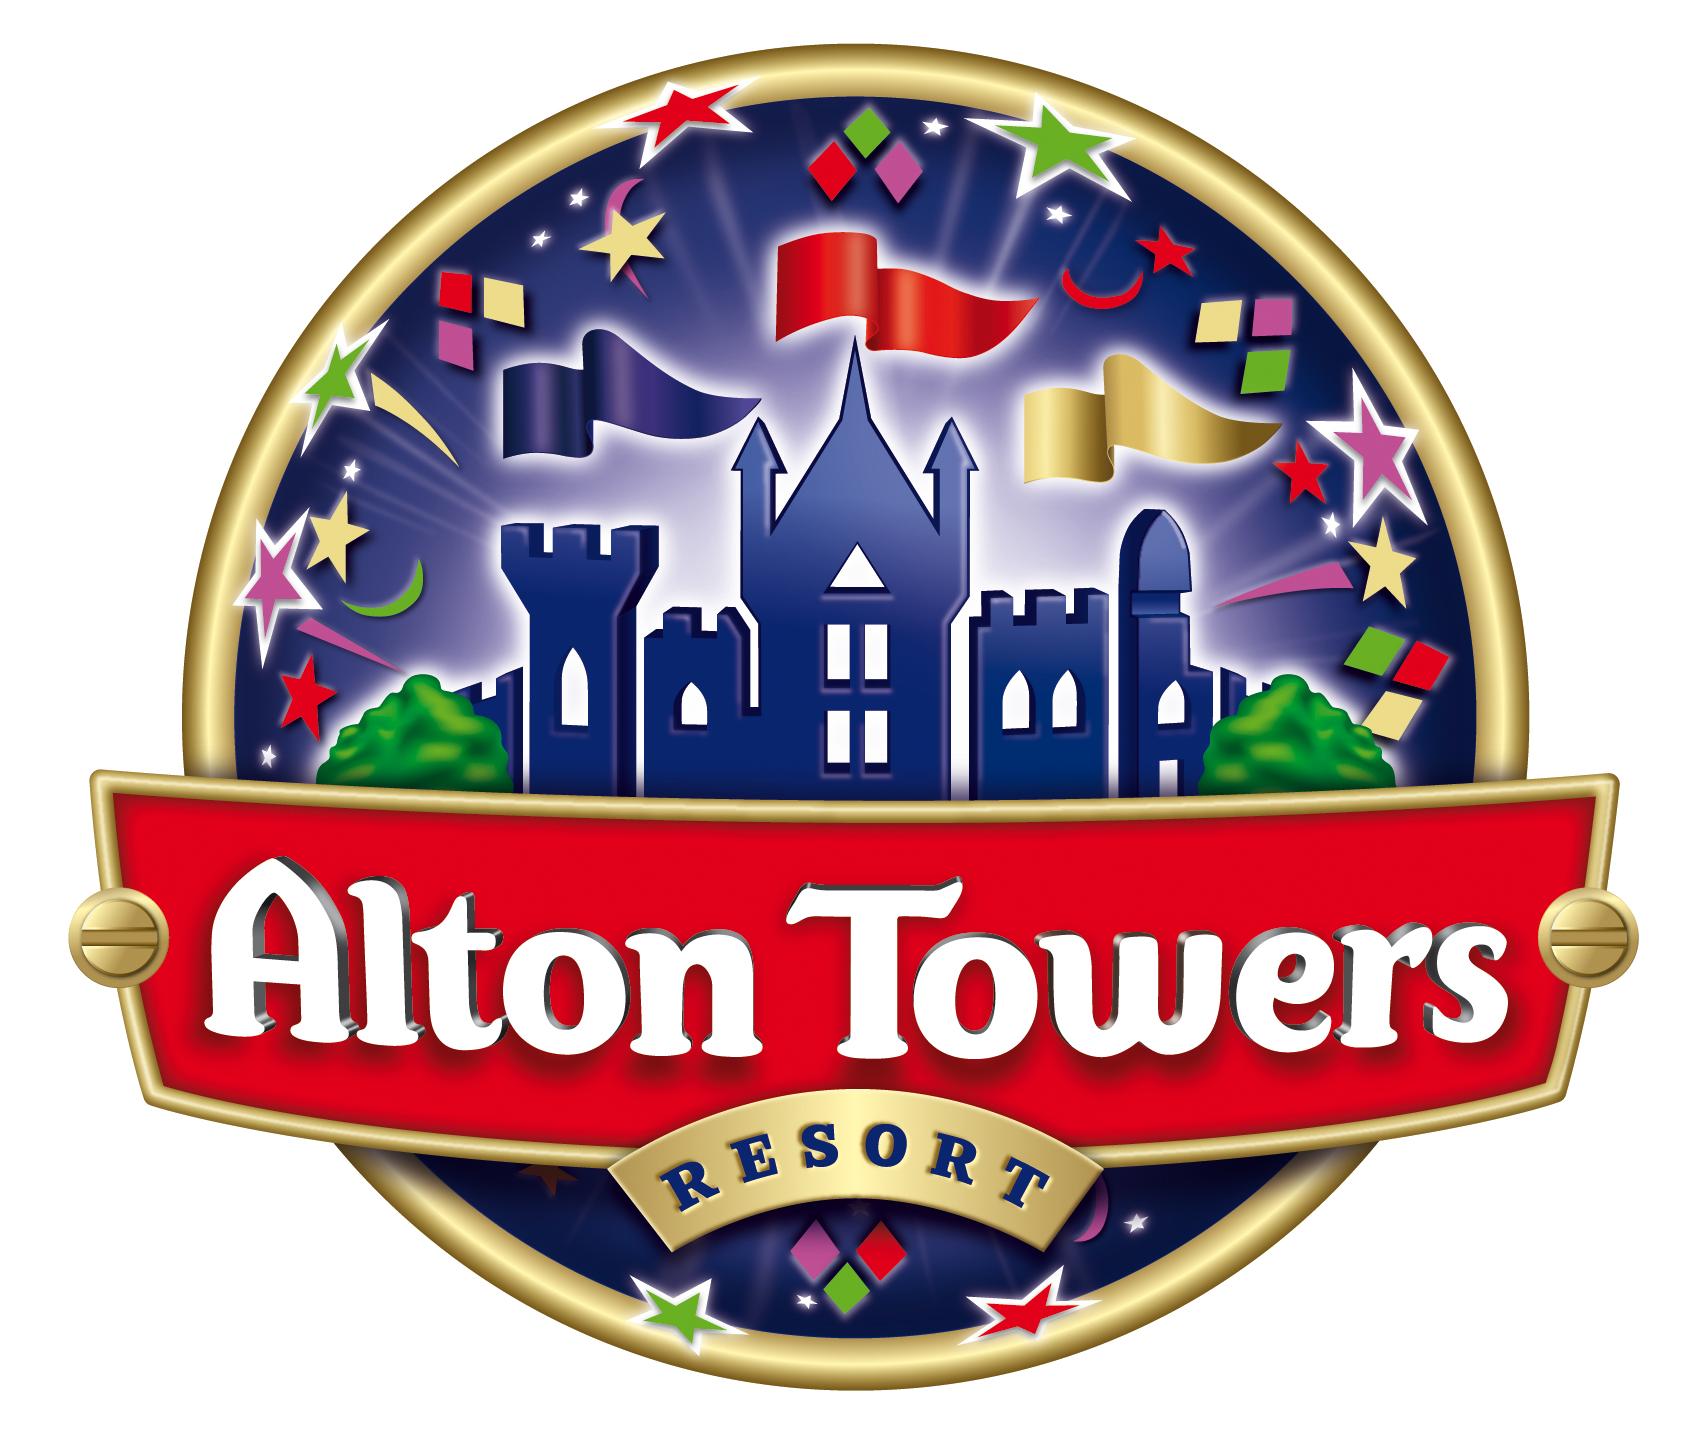 Alton Towers Resort logo